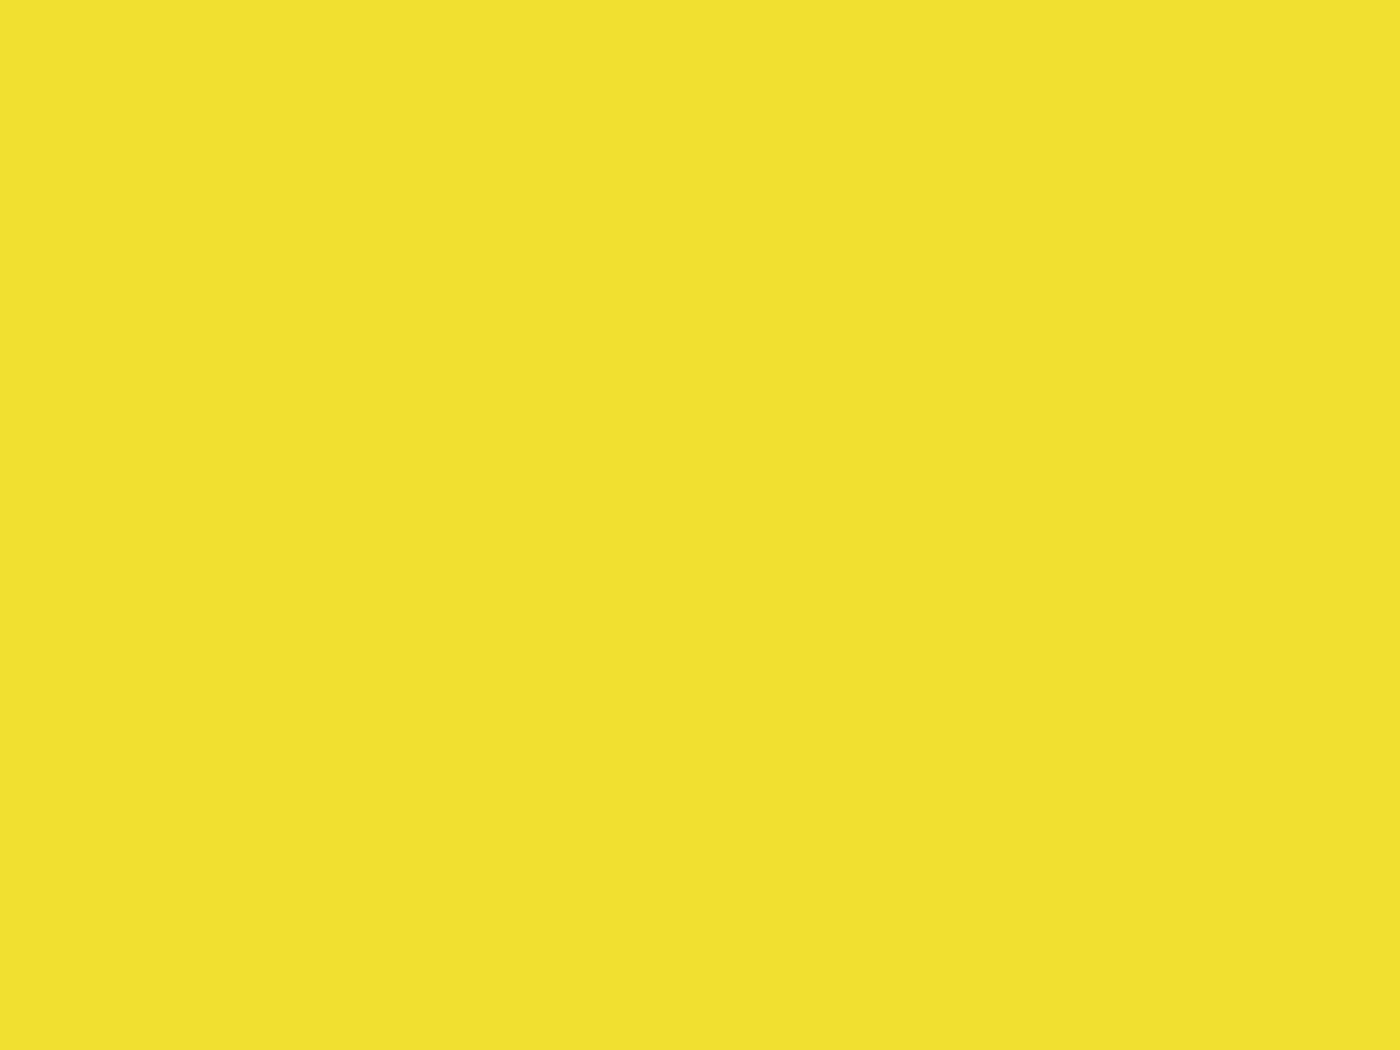 1400x1050 Dandelion Solid Color Background